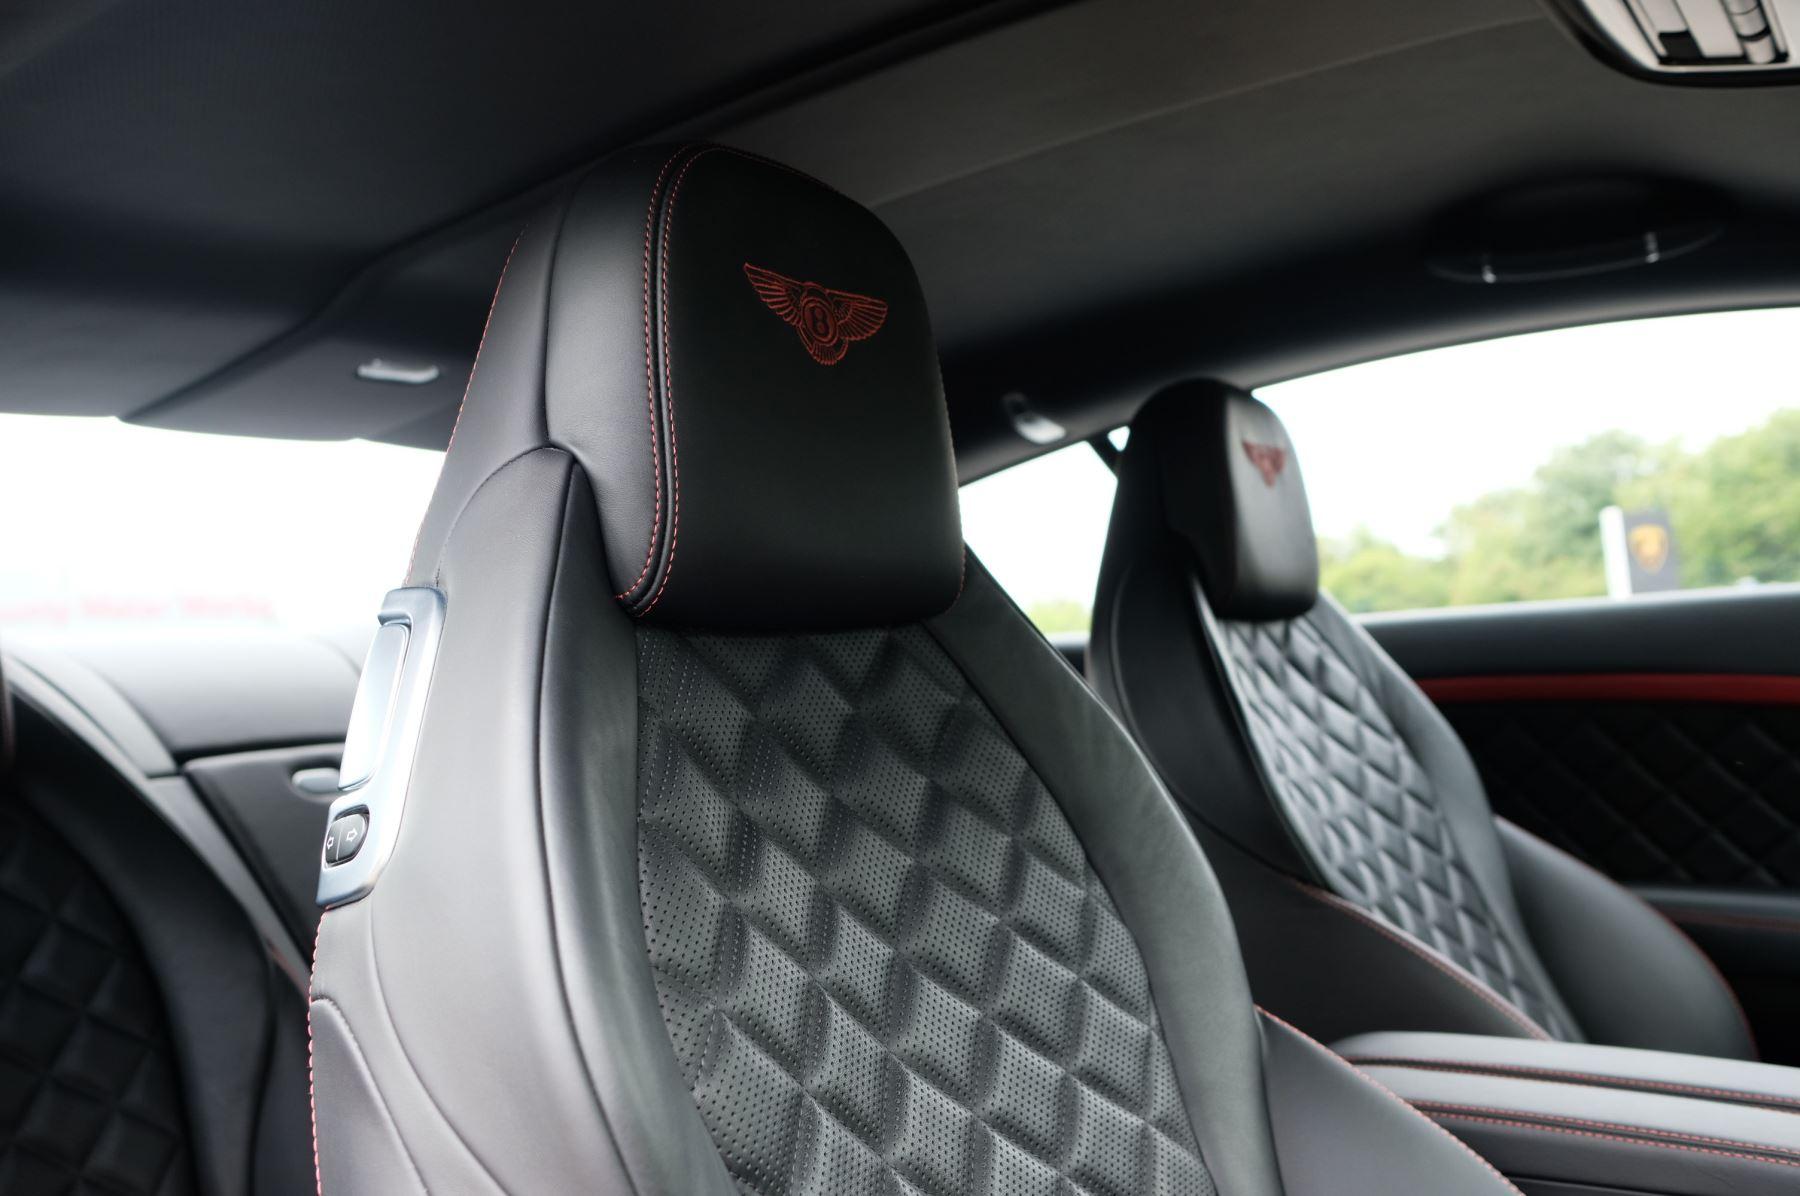 Bentley Continental GT 6.0 W12 [635] Speed - Premier Specification - Carbon Fibre Fascia Panels image 19